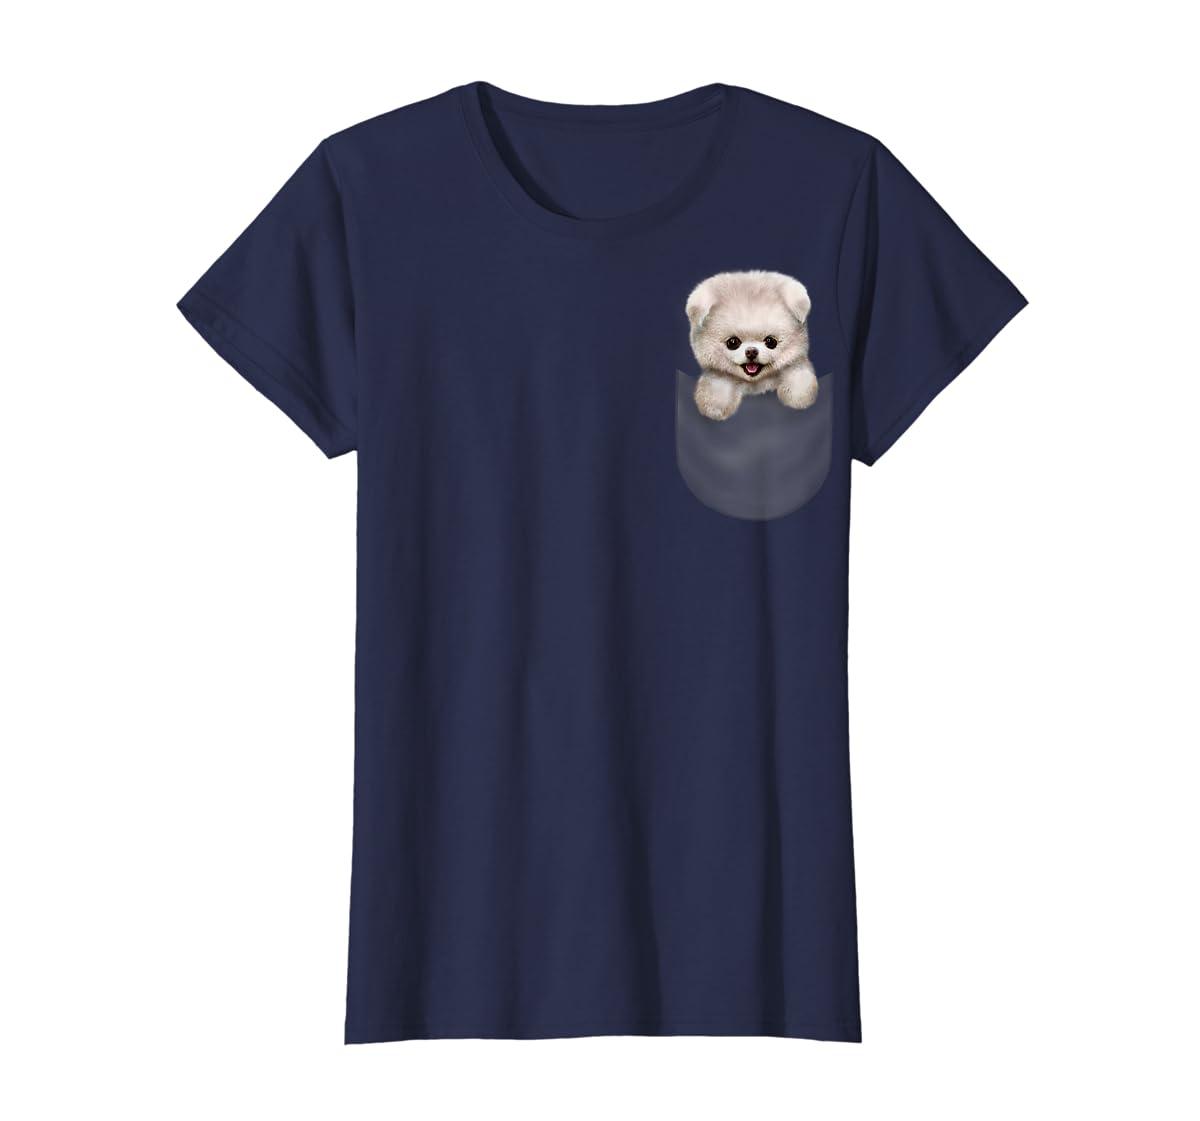 T-Shirt, Cute White Fluffy Pomeranian Puppy in Pocket, Dog-Women's T-Shirt-Navy